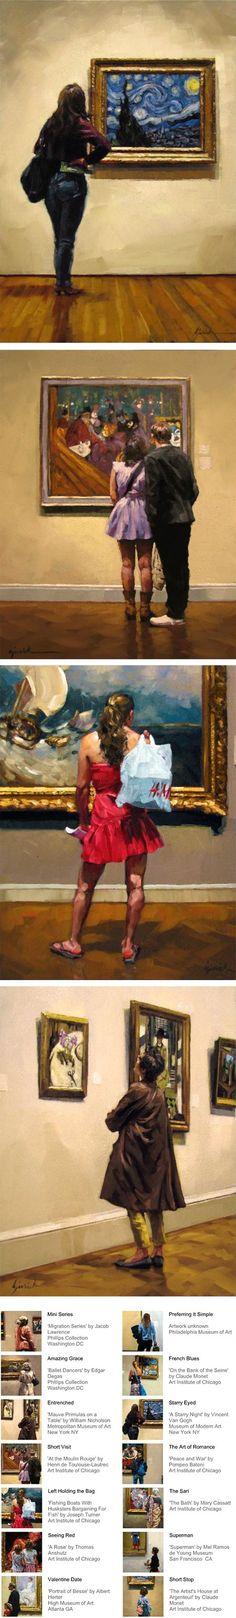 Atlanta based painter Karin Jurick series of paintings of art museum patrons, in situ, as it were, their backs to the viewer as they stood engrossed in the artwork before them.